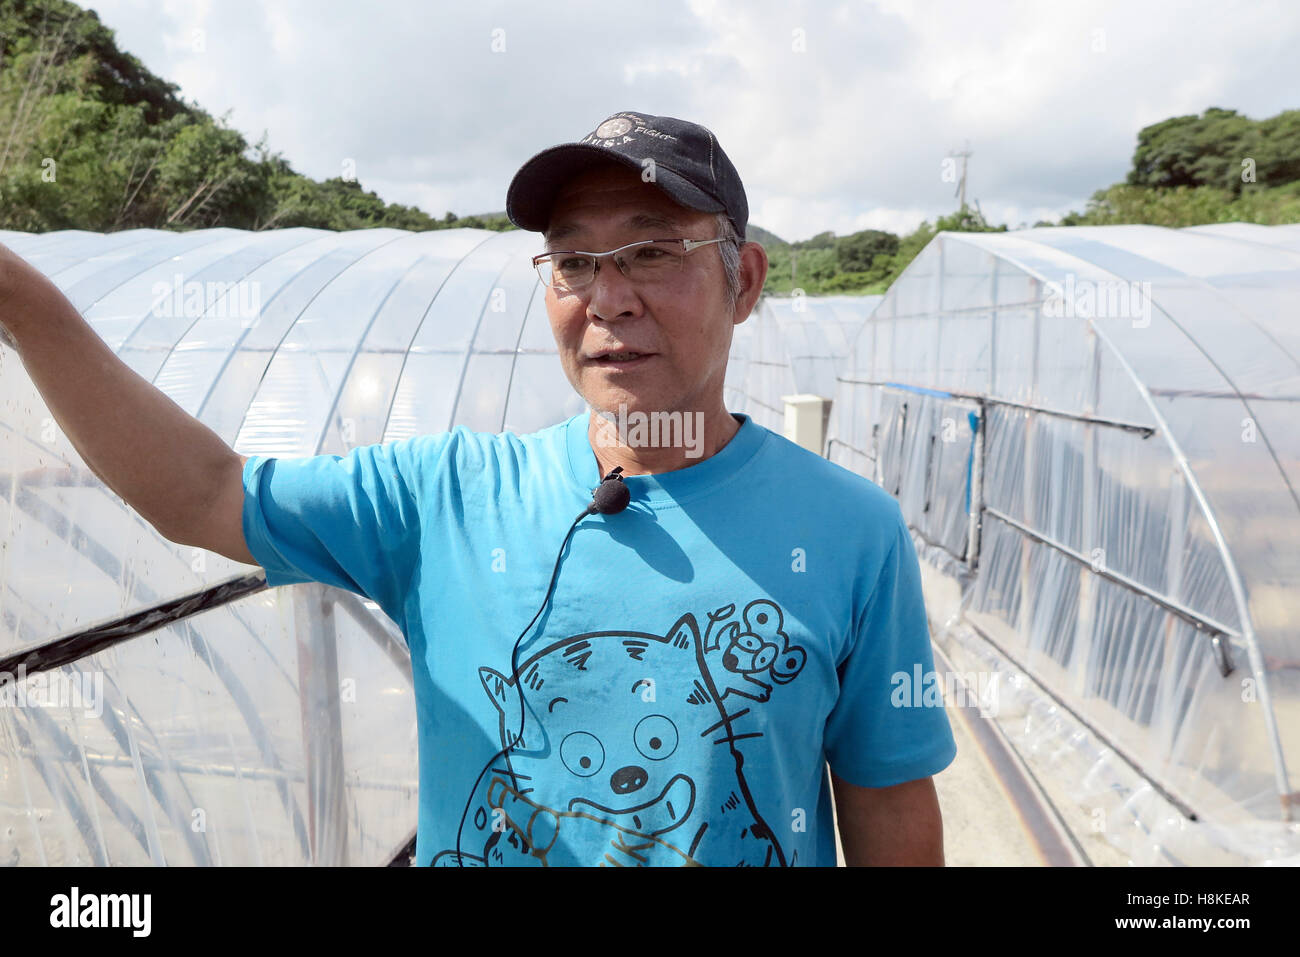 Ibuski, Japan. 13th Sep, 2016. Japanese eel breeder Hironobu Imamura in Ibuski, Japan, 13 September 2016. Hironobu - Stock Image